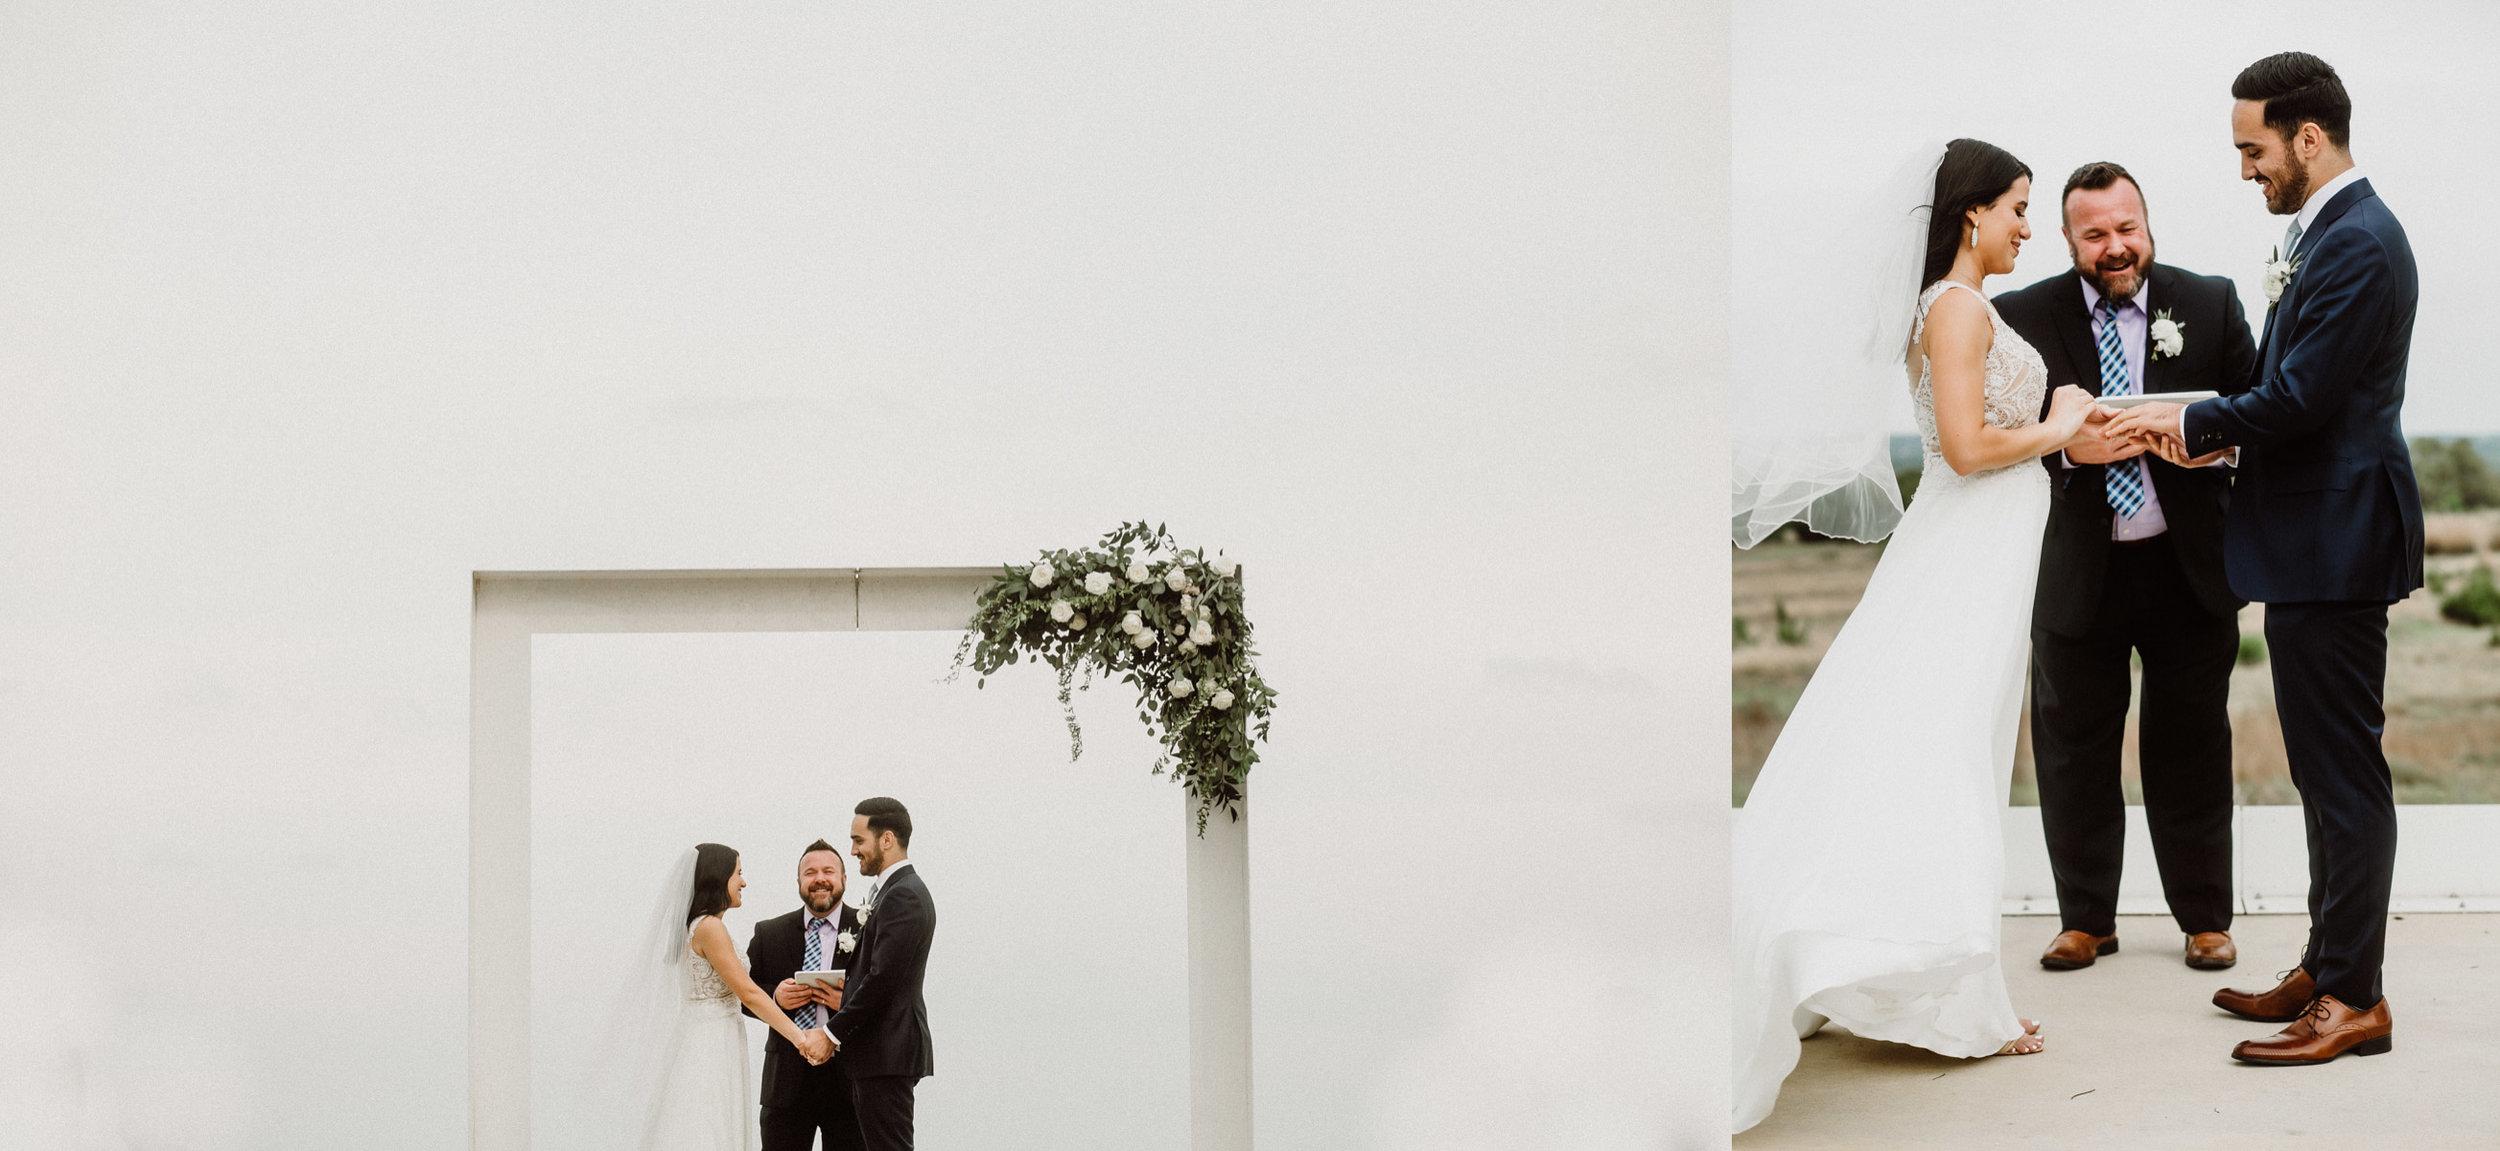 prospect-house-wedding-8.jpg